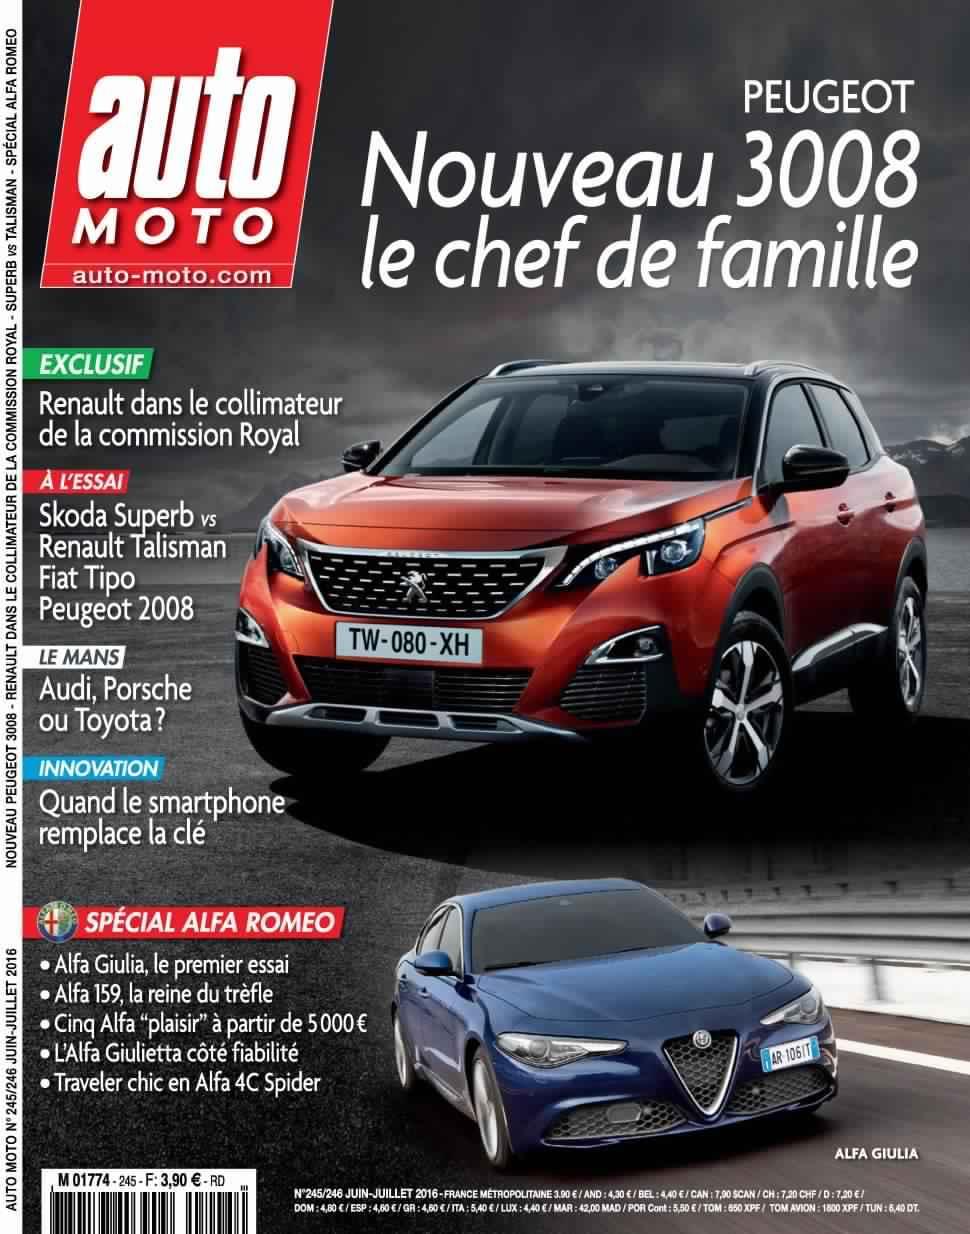 Auto Moto 245-246 - Juin-Juillet 2016